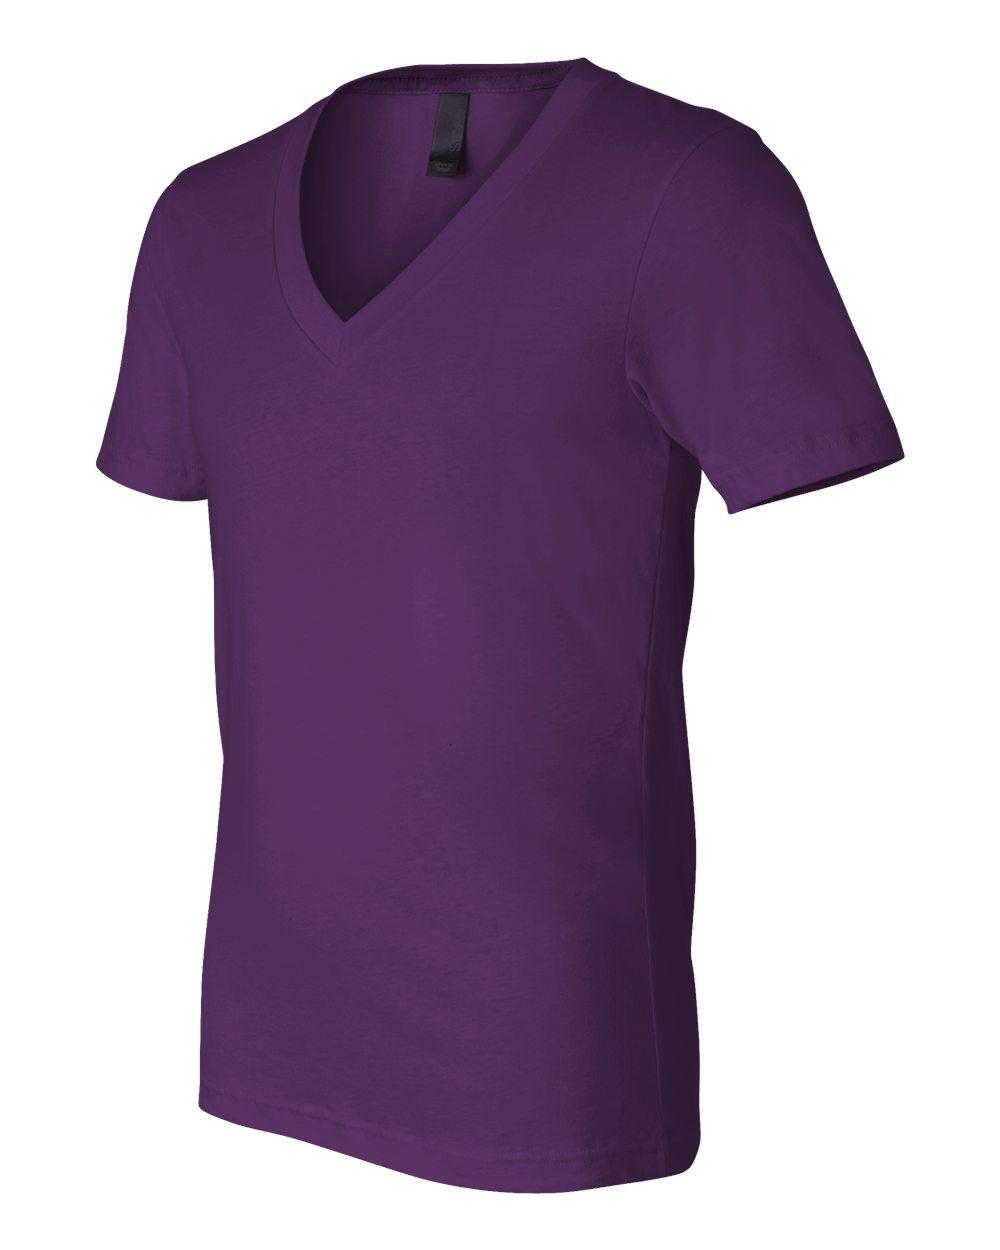 Bella 3105 Team Purple